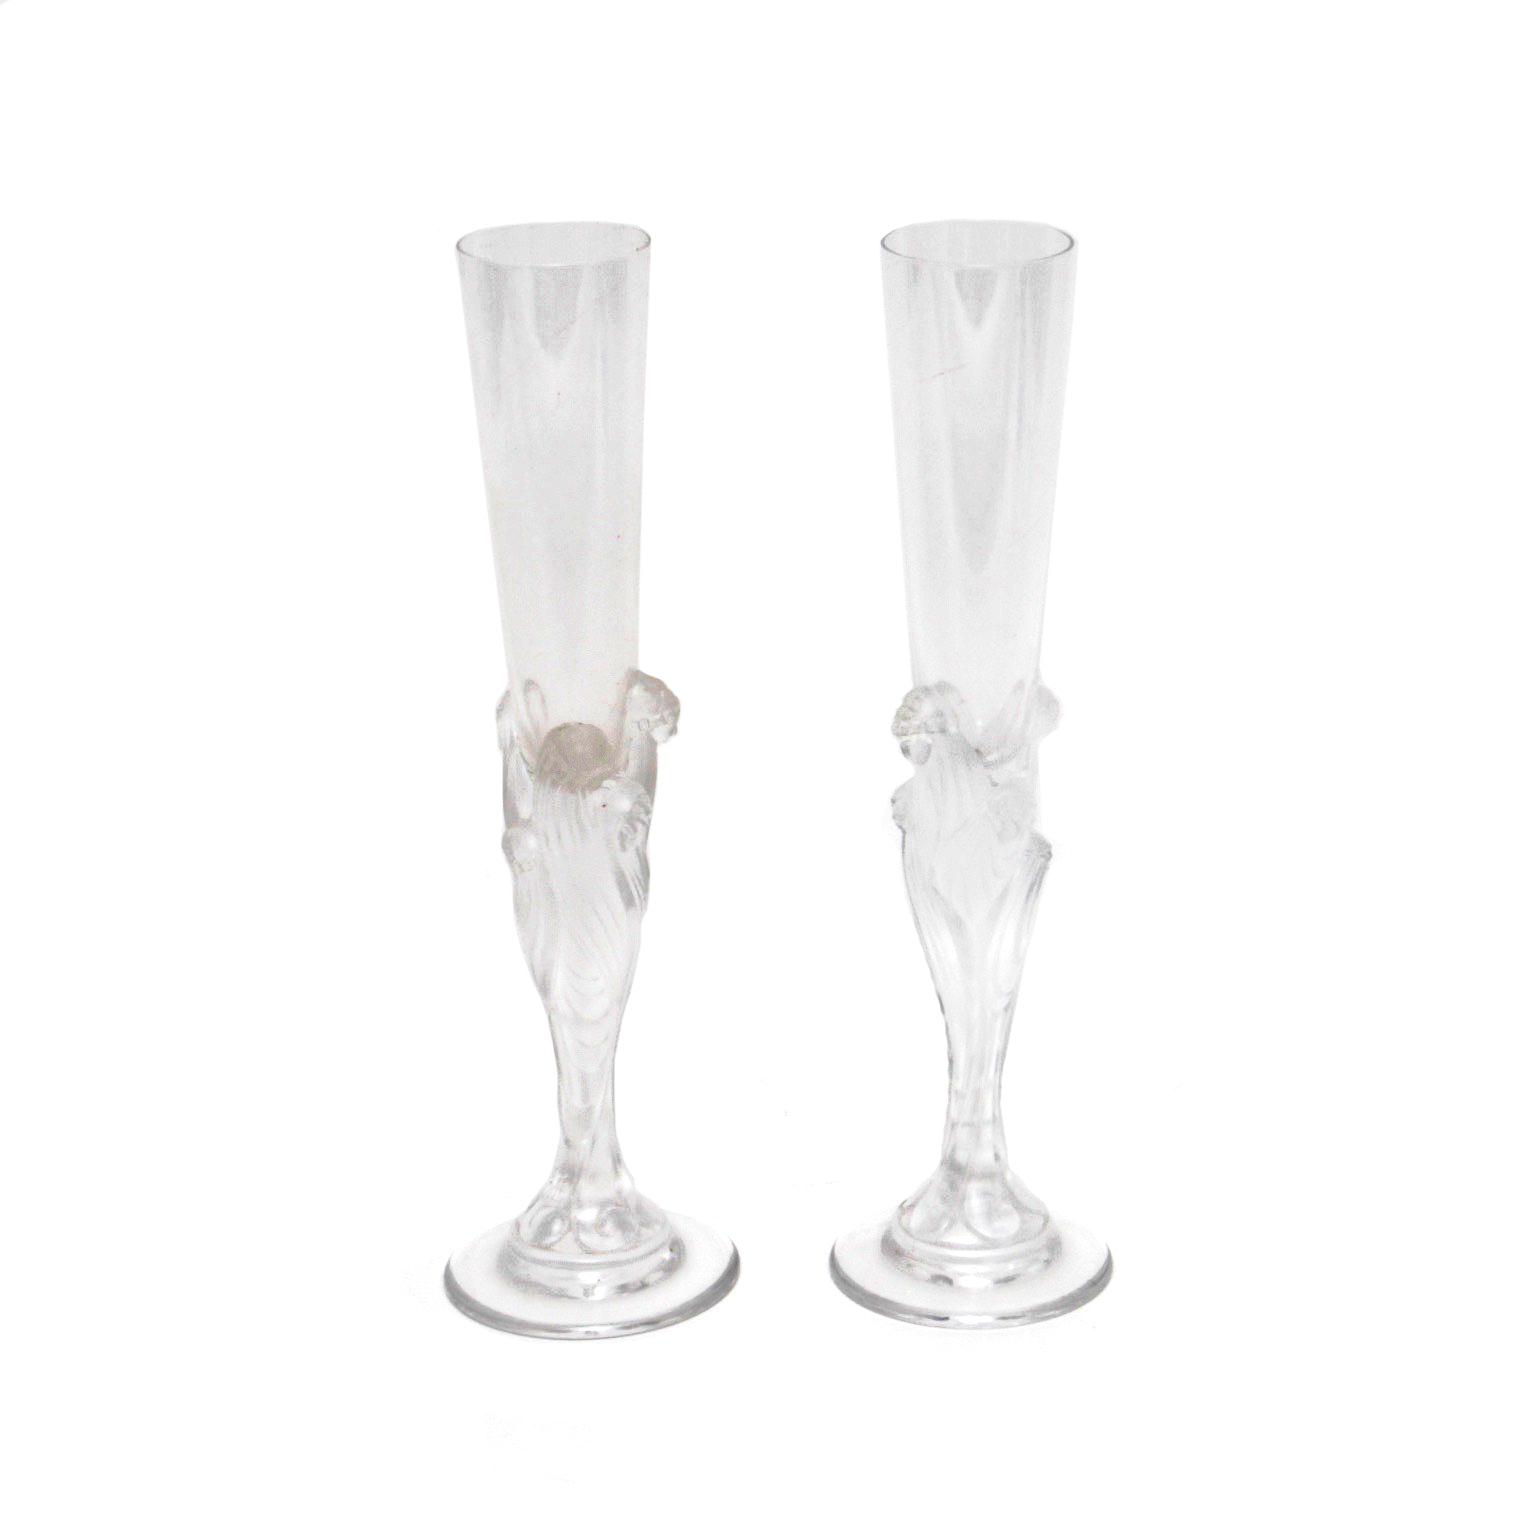 Pair of Erte' Champagne Flutes